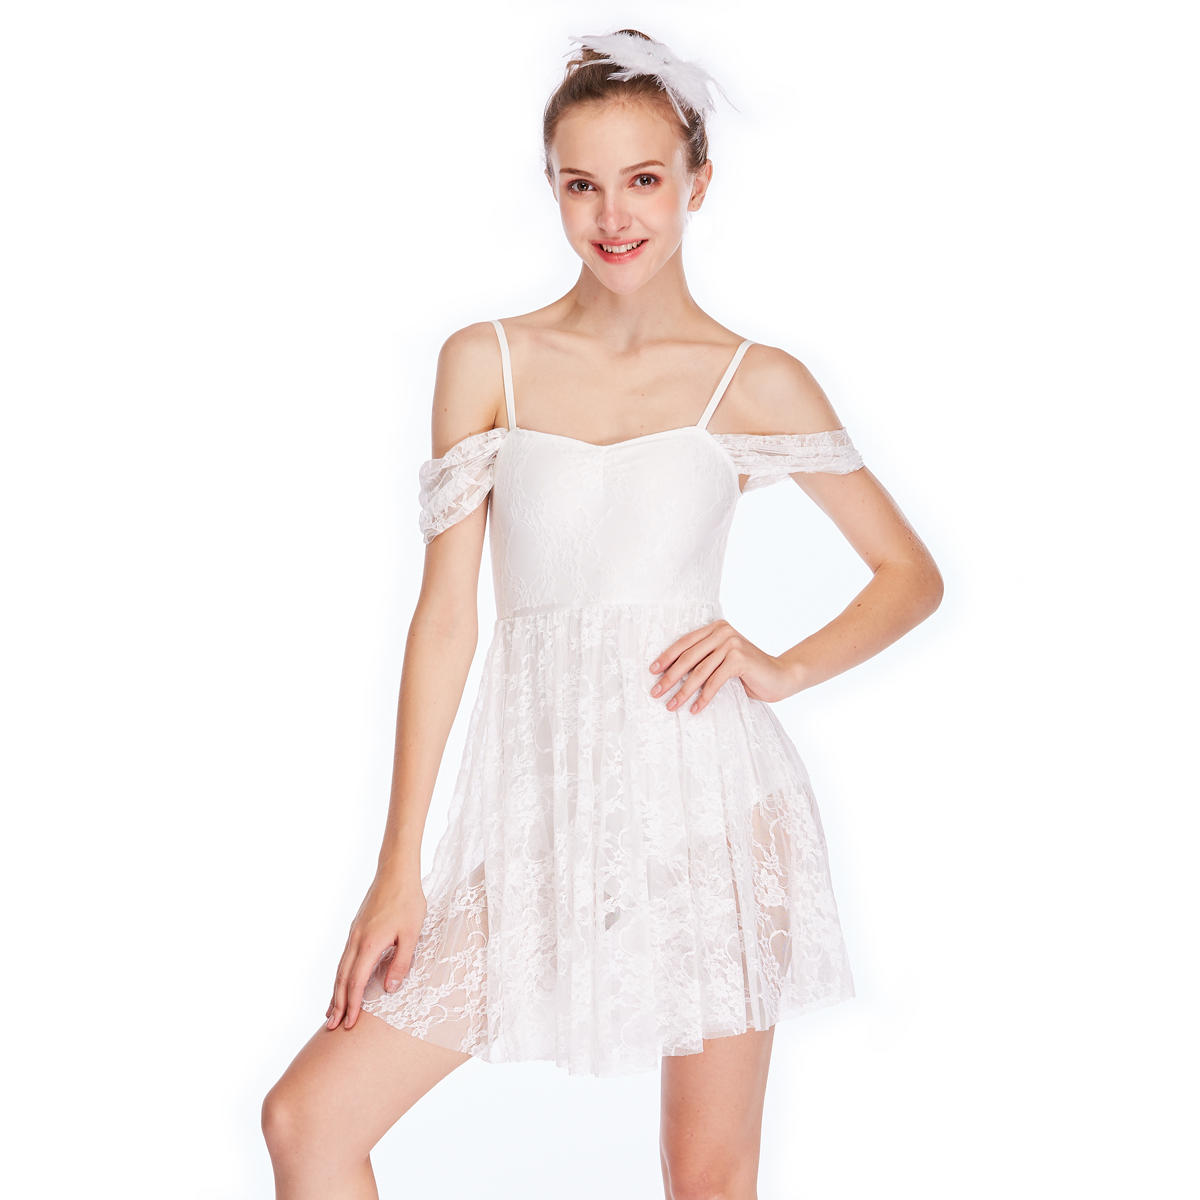 MiDee Girl Ballet  Ballroom Dancing Skirt Bollywood Dance Costumes